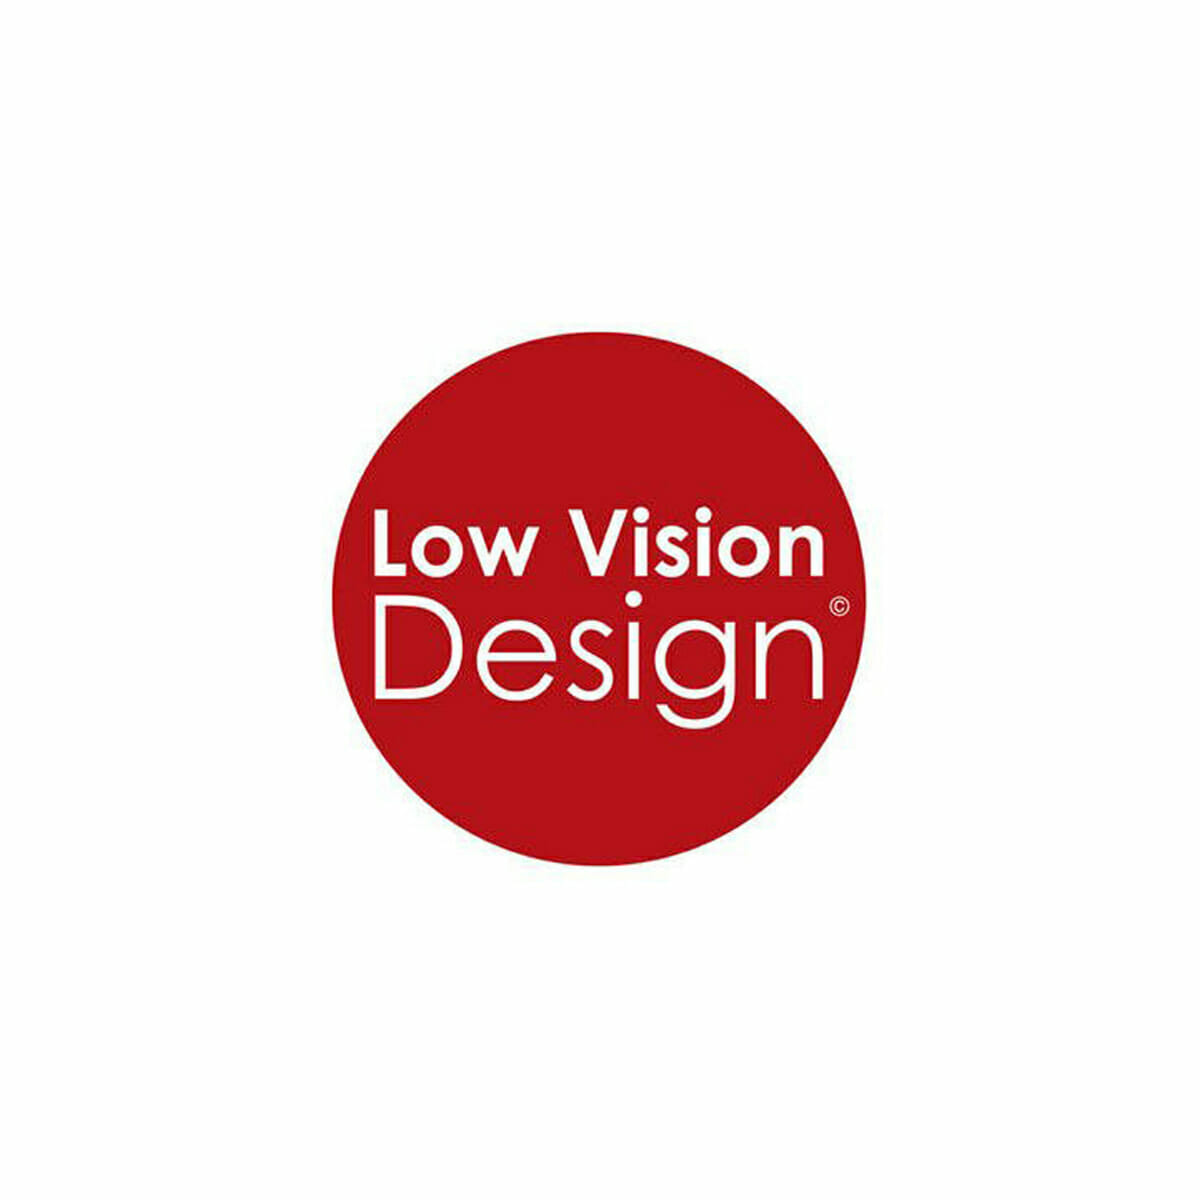 Low vision design logo